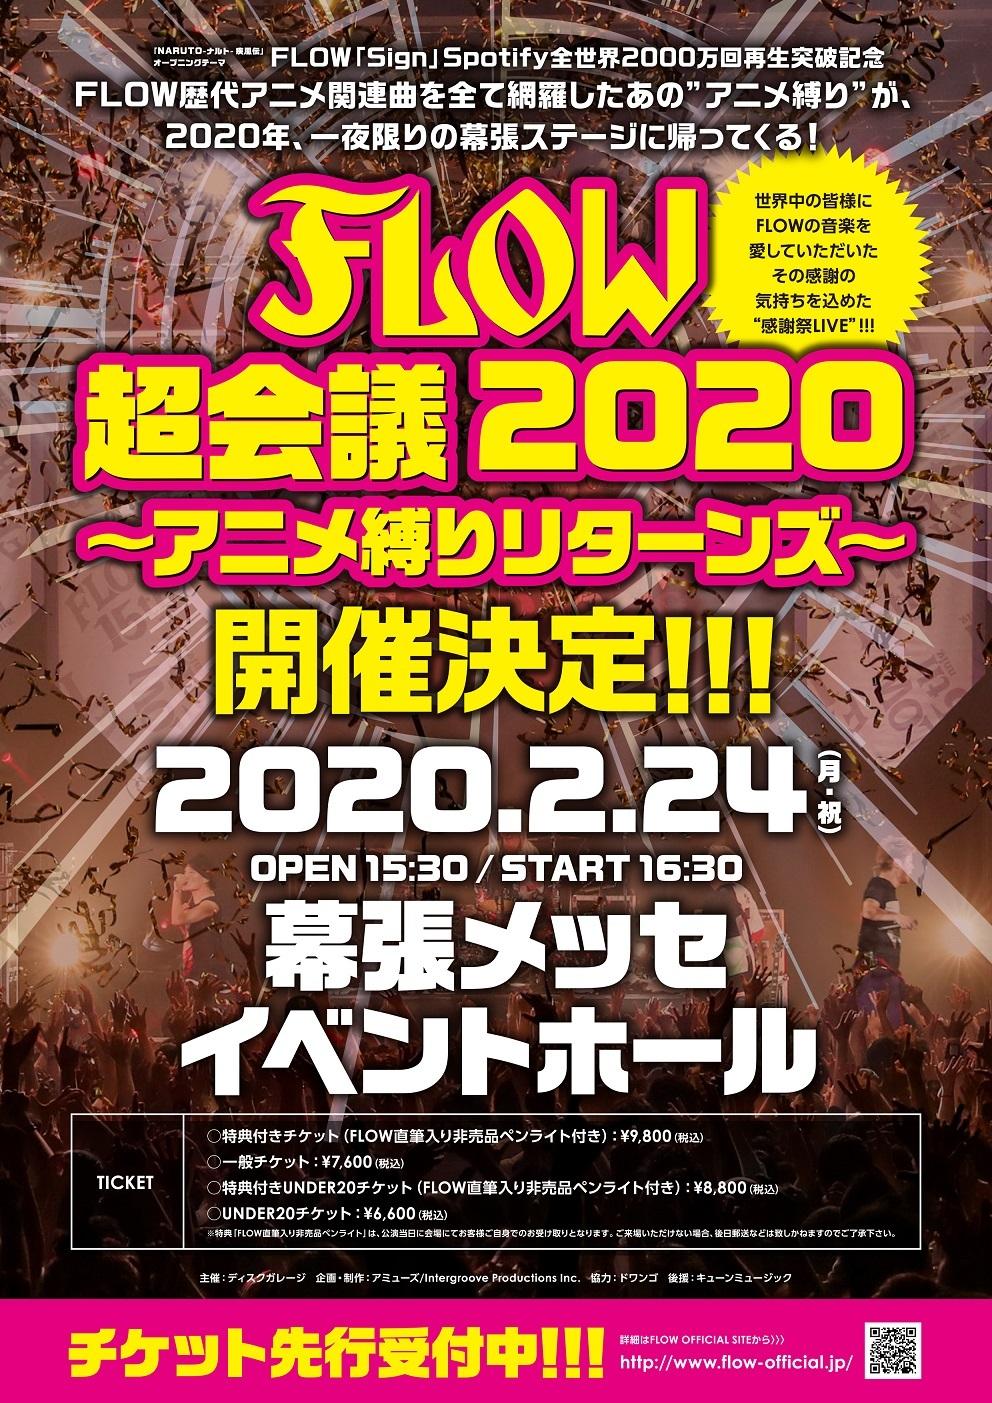 『FLOW 超会議 2020 〜アニメ縛りリターンズ〜』